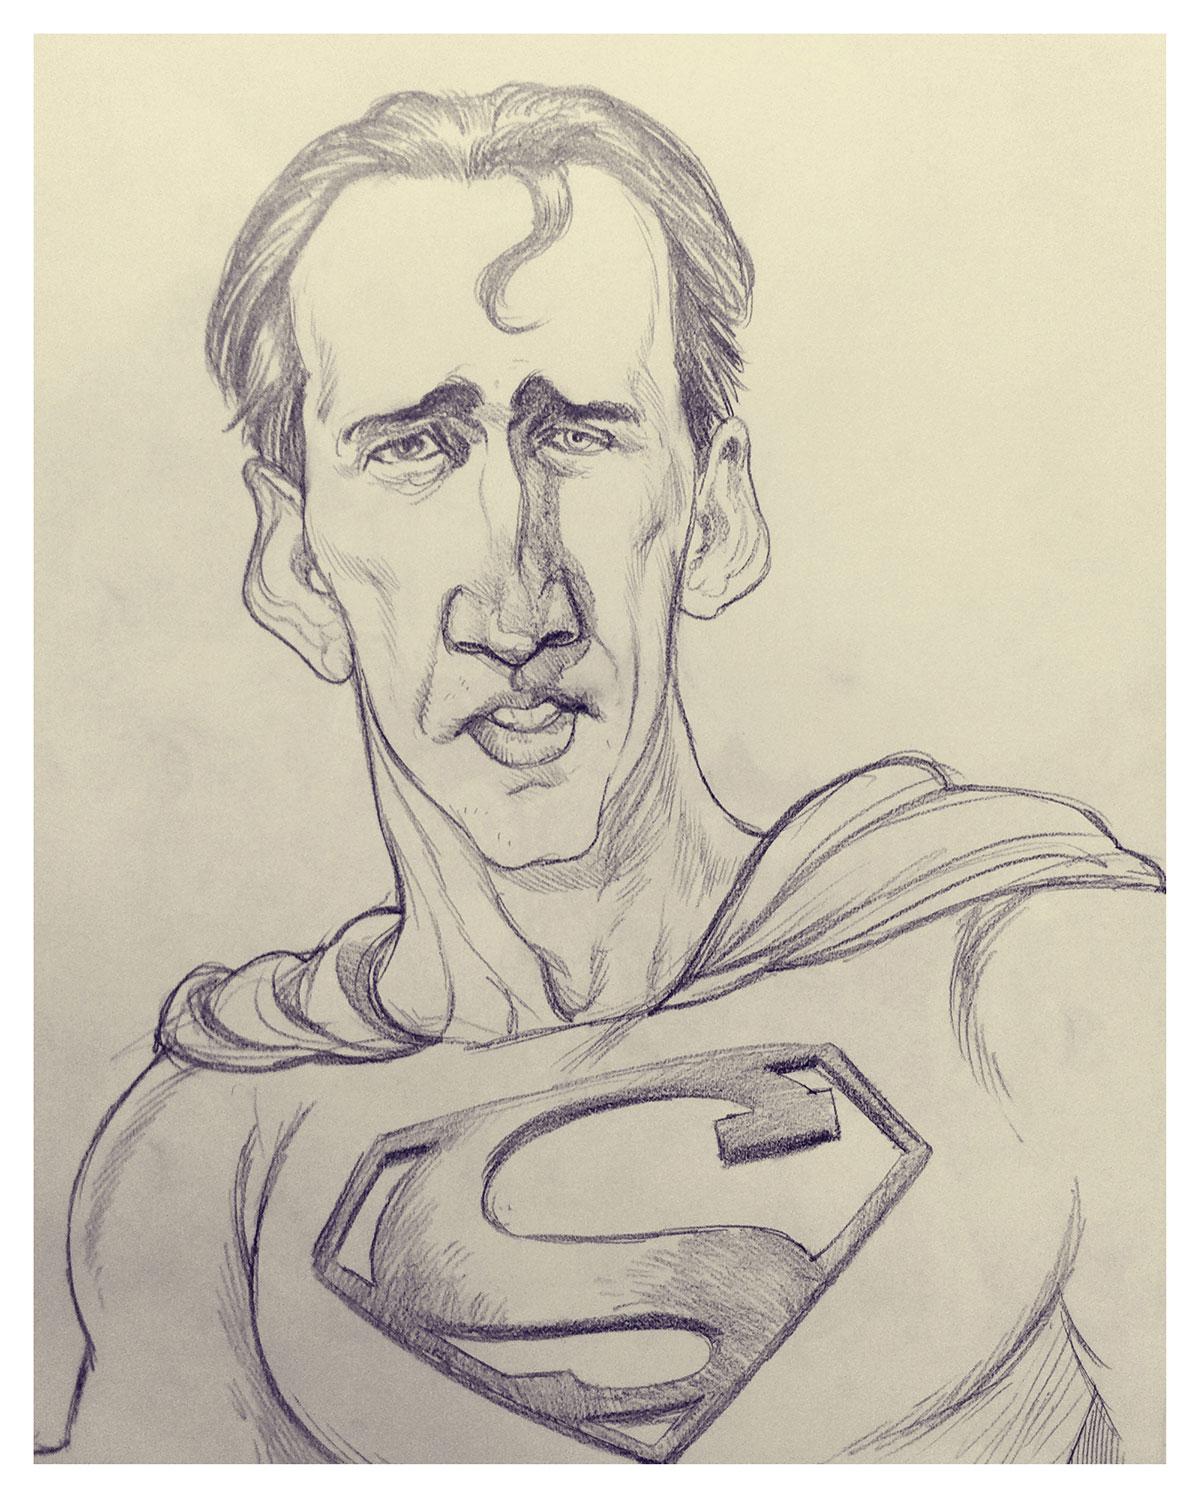 nicolas-cage-superman-diburros-braga1